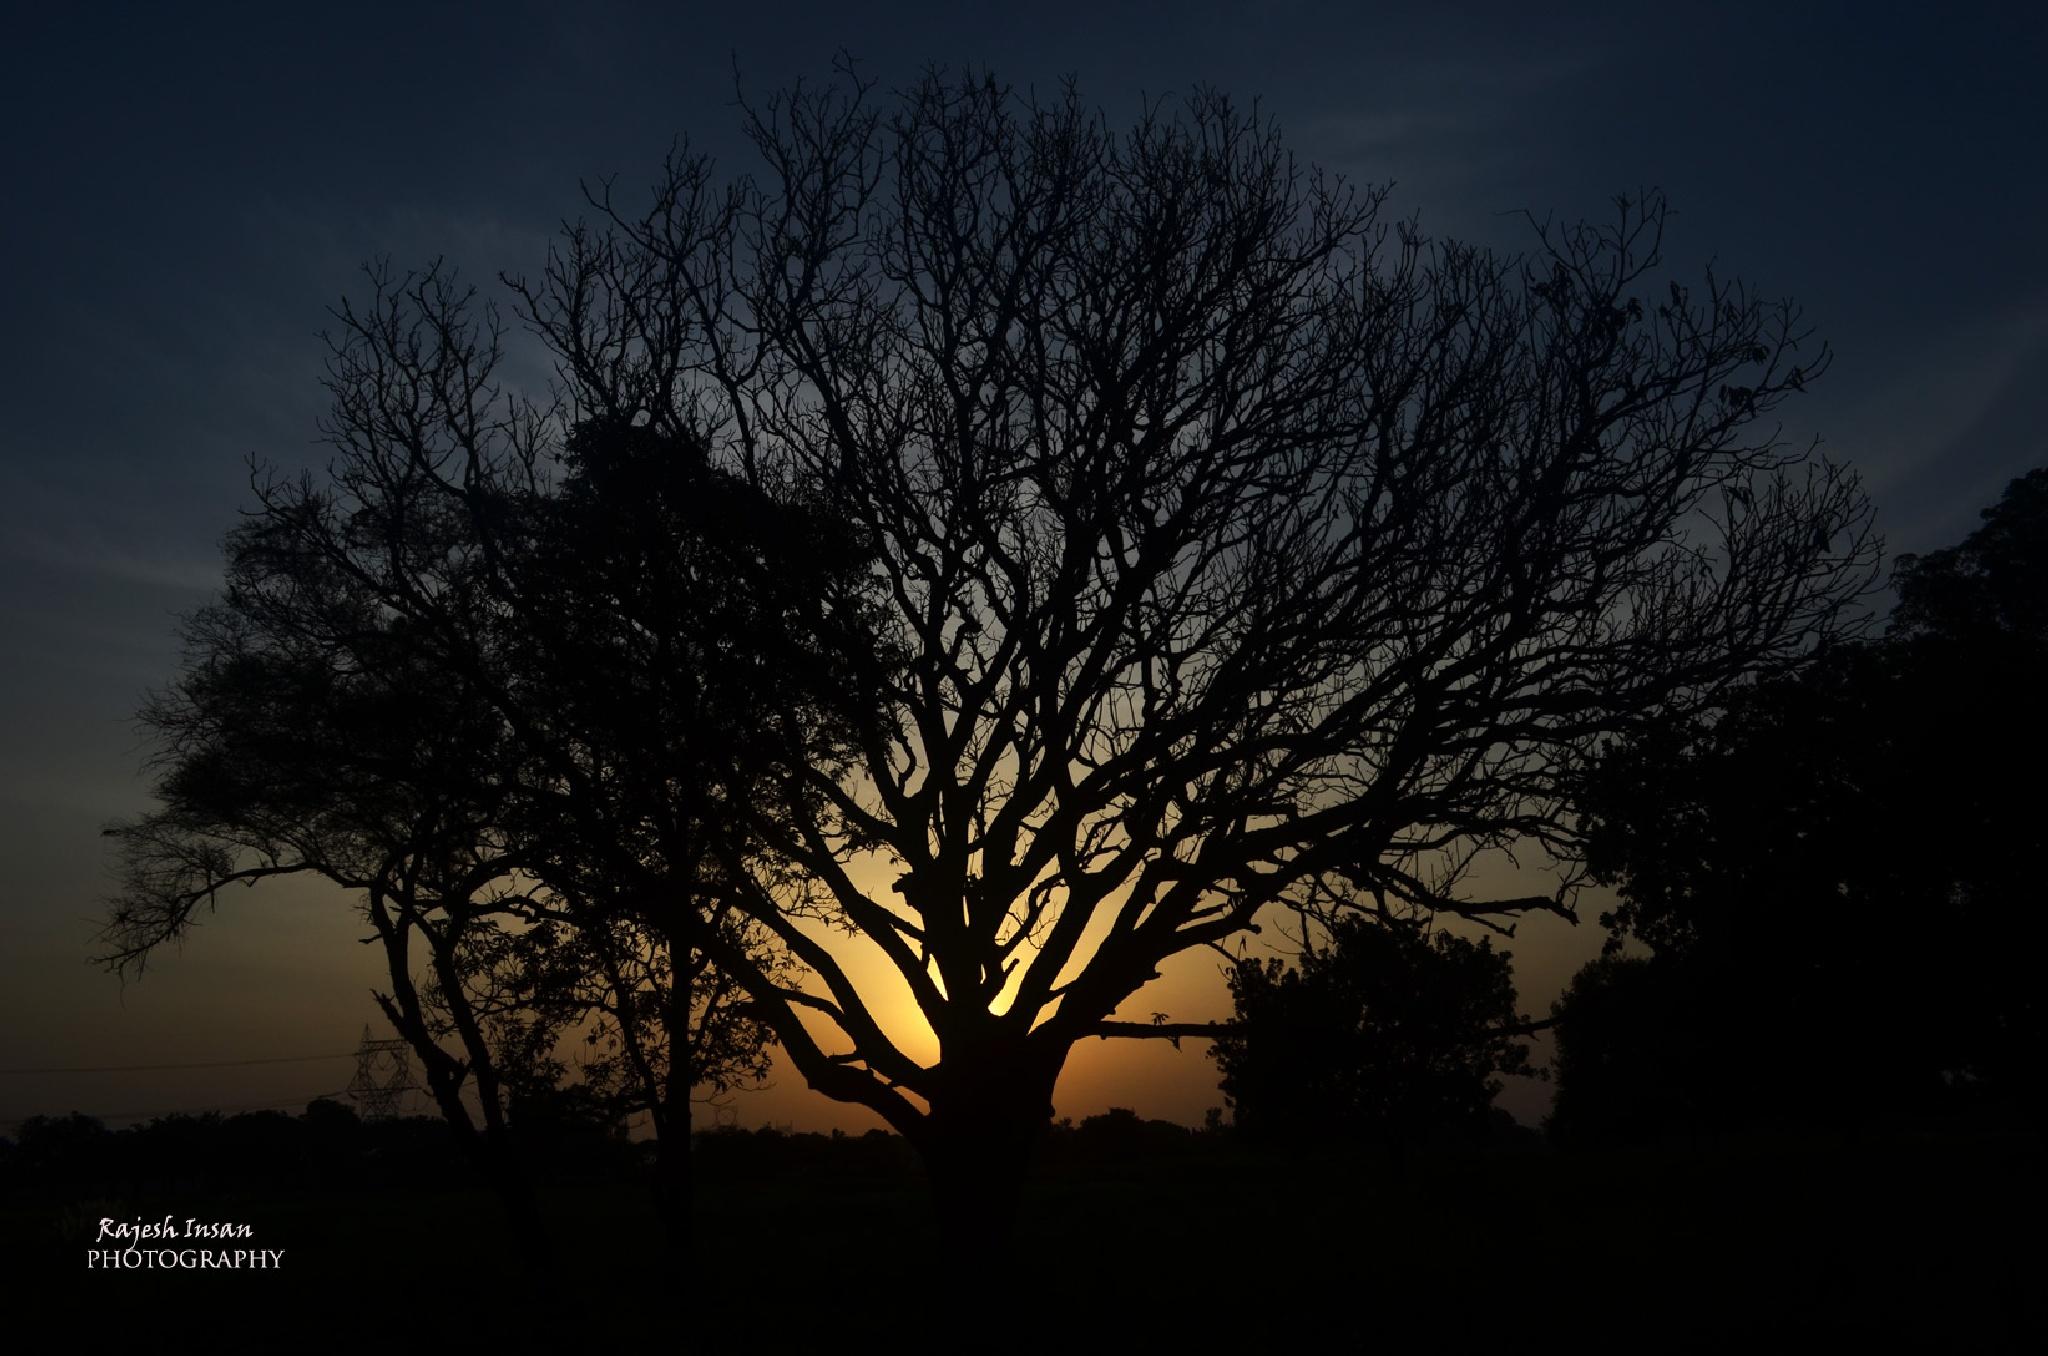 """beyond the light"" by RajeshInsan"